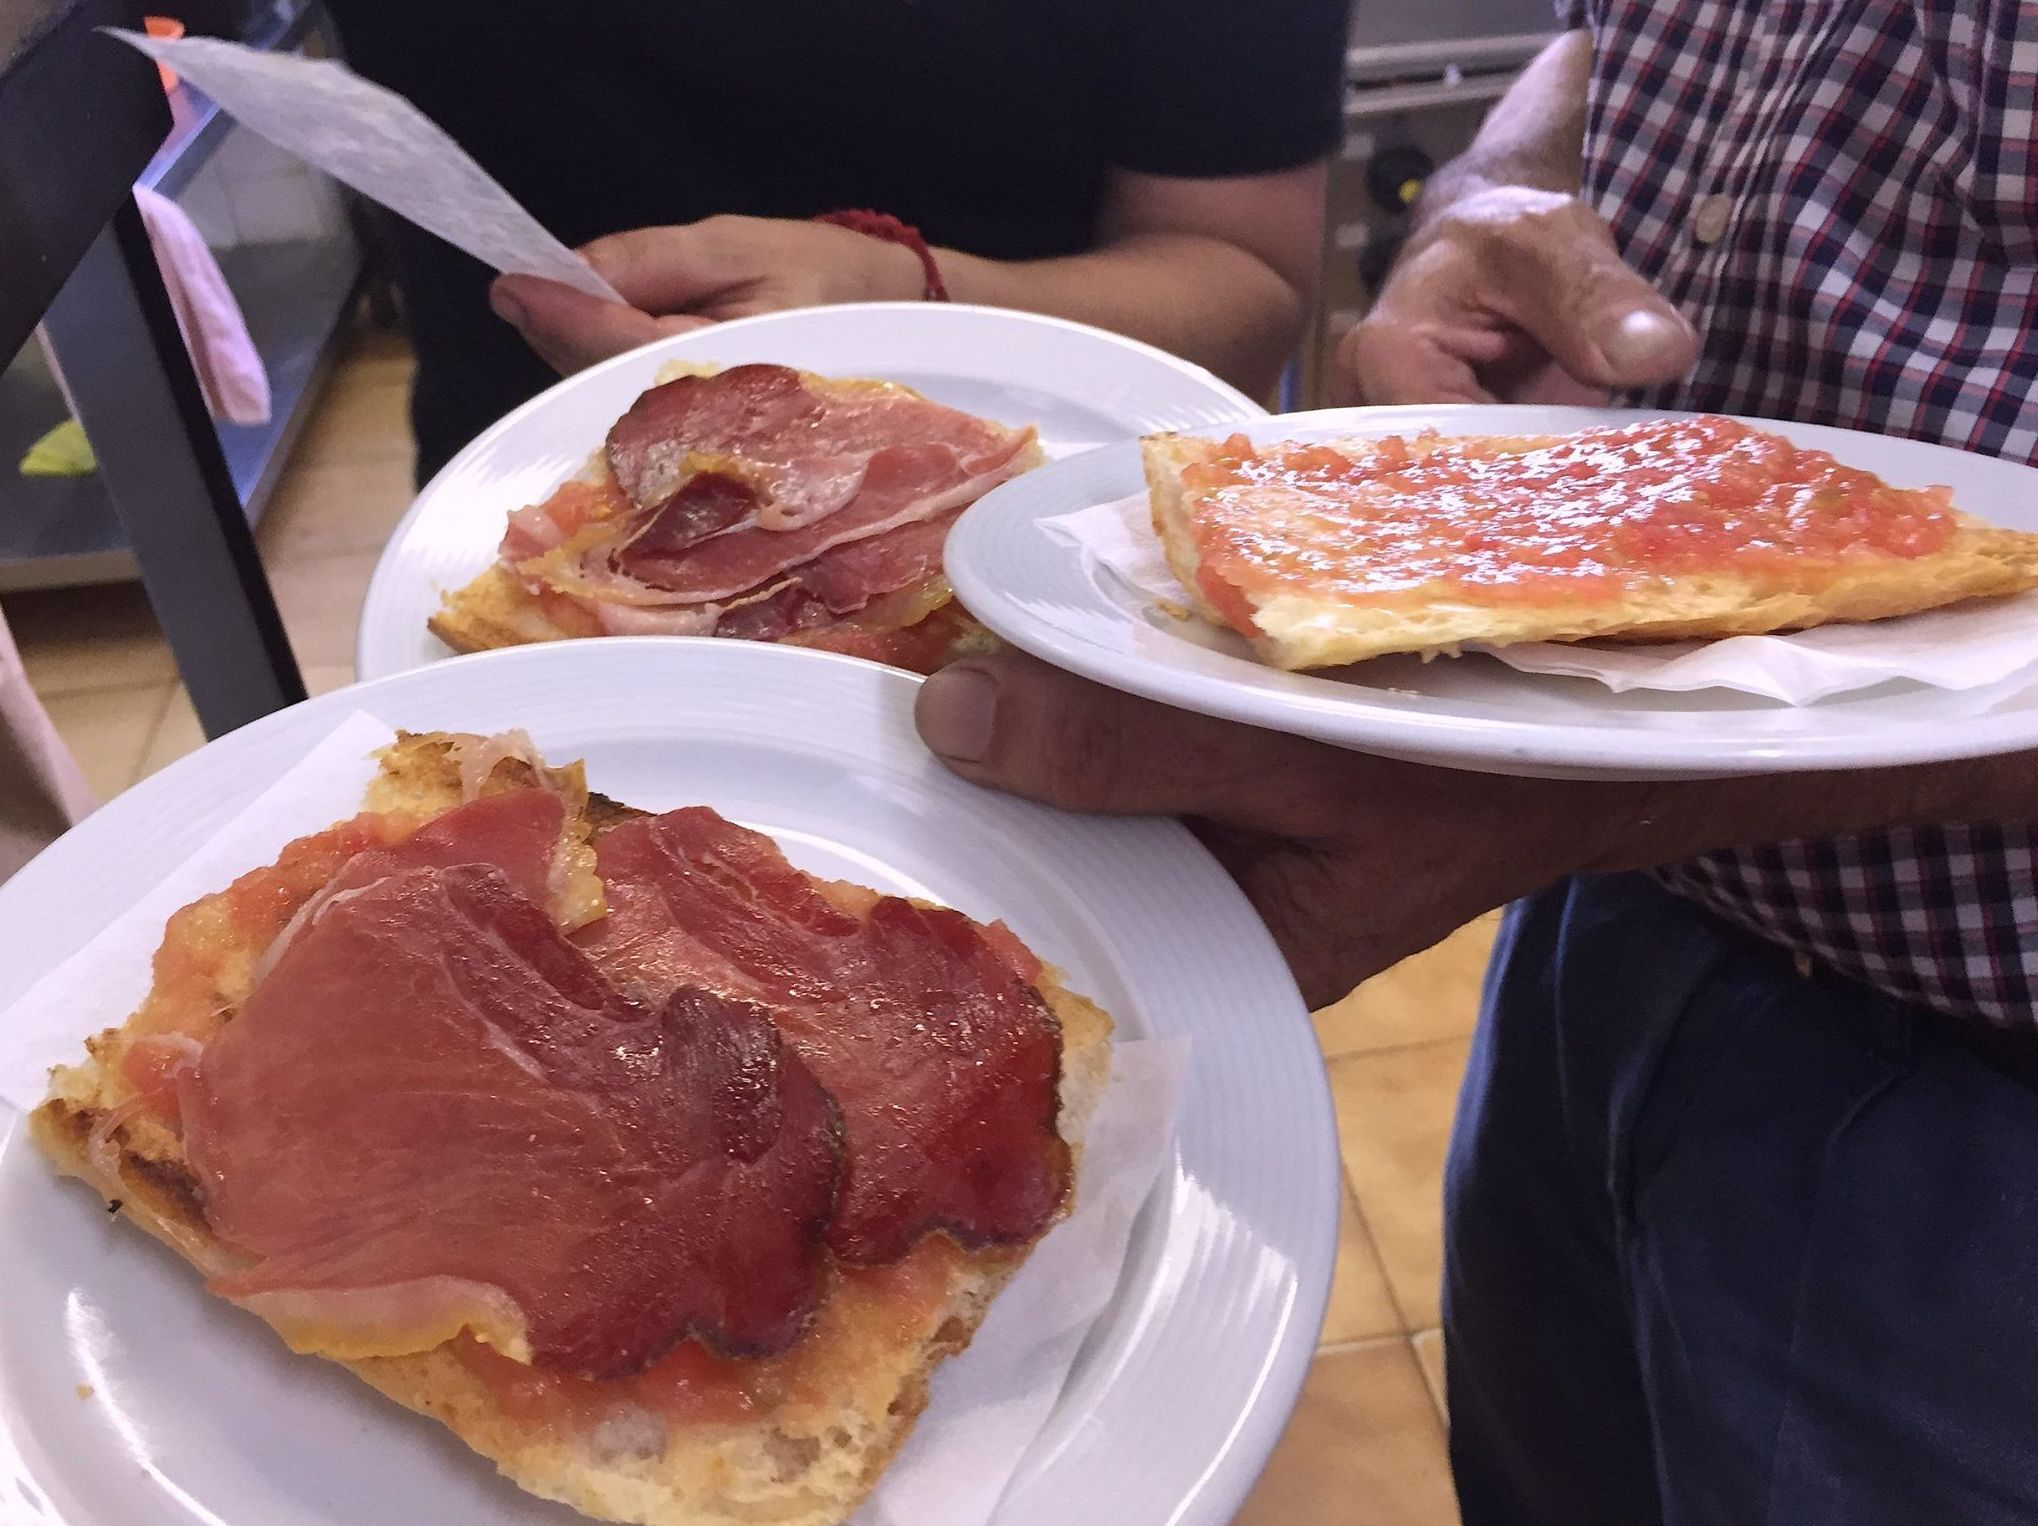 Pan con tomate y jamón